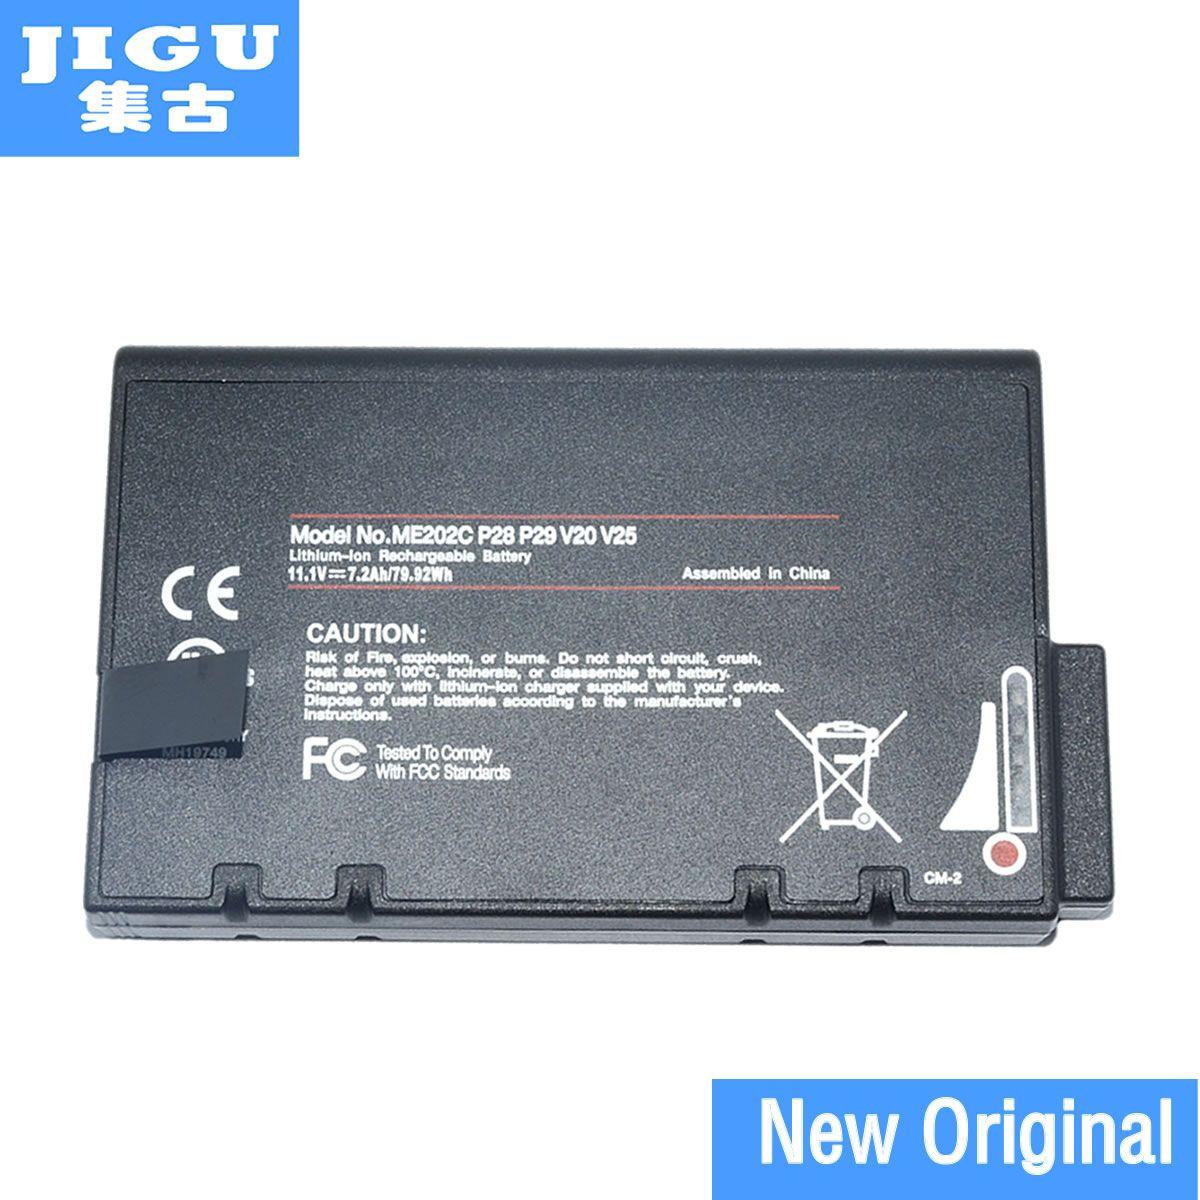 JIGU 33-01PI 338911120104 BP-LP2900 Original Laptop Batterie Für HASEE LI202S ME202C ME202EK RS2020 S400 GETAC 11,1 v 79.92WH